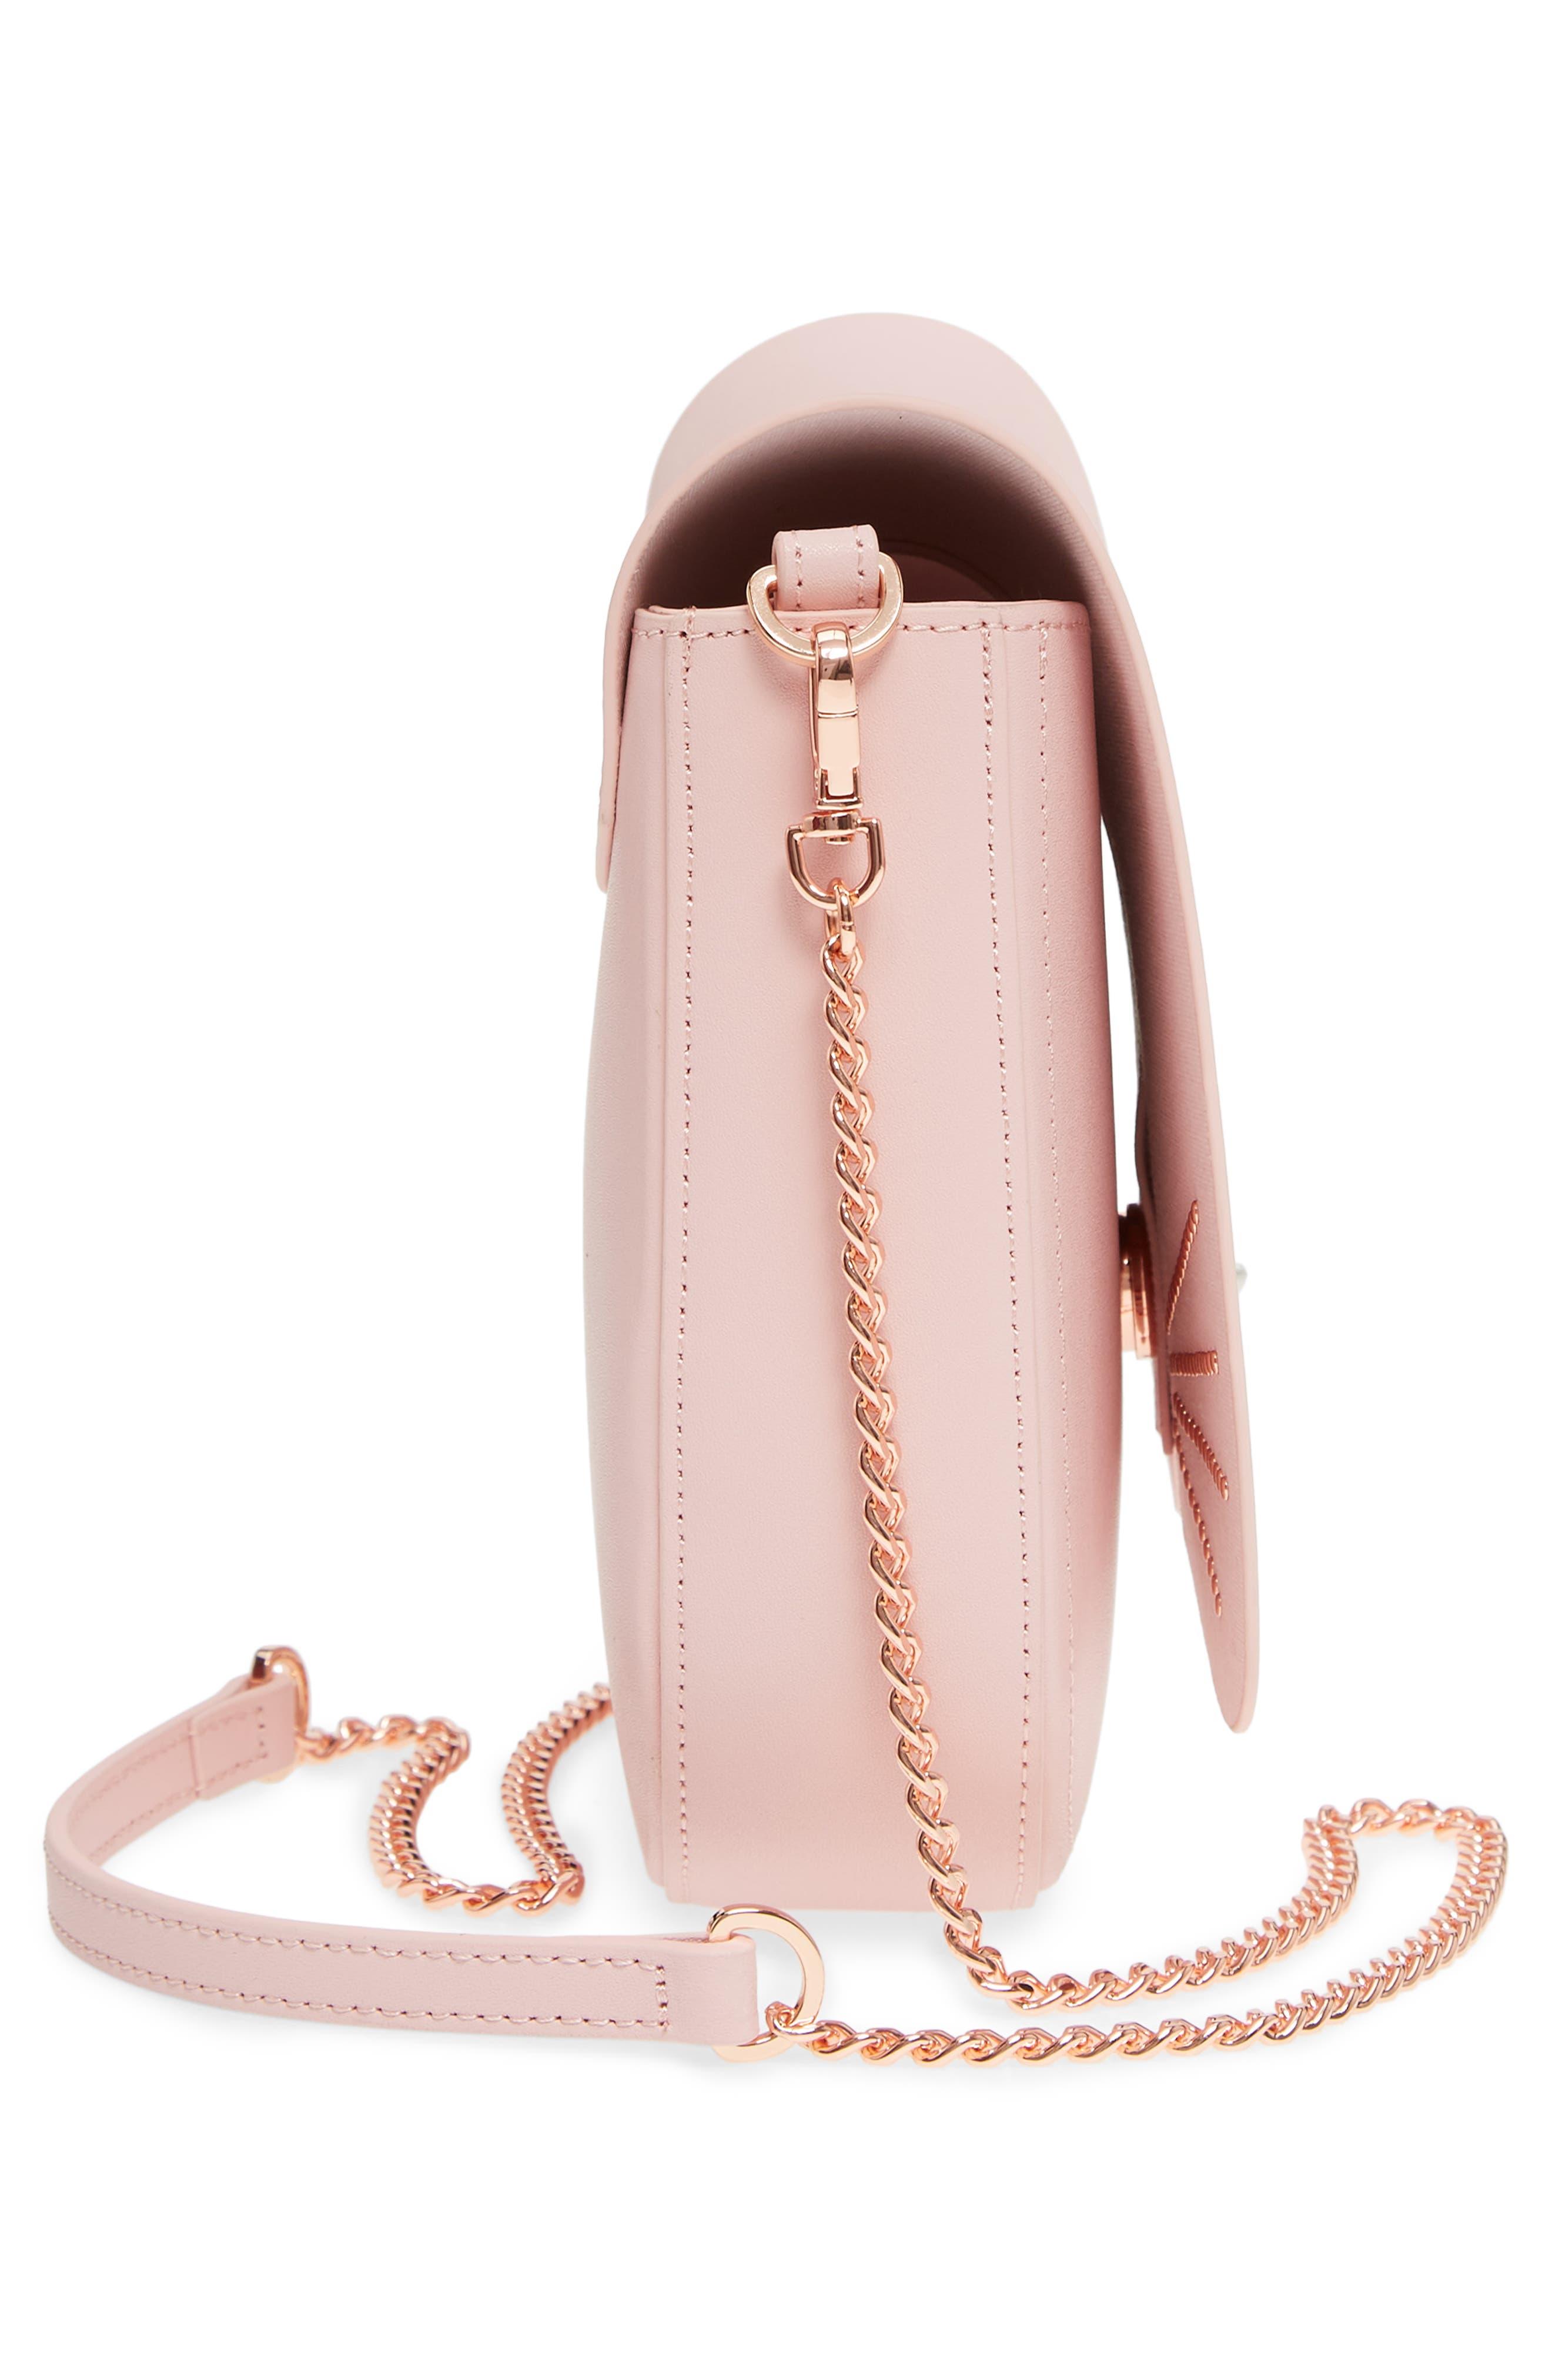 Chriiss Cat Stud Leather Crossbody Bag,                             Alternate thumbnail 14, color,